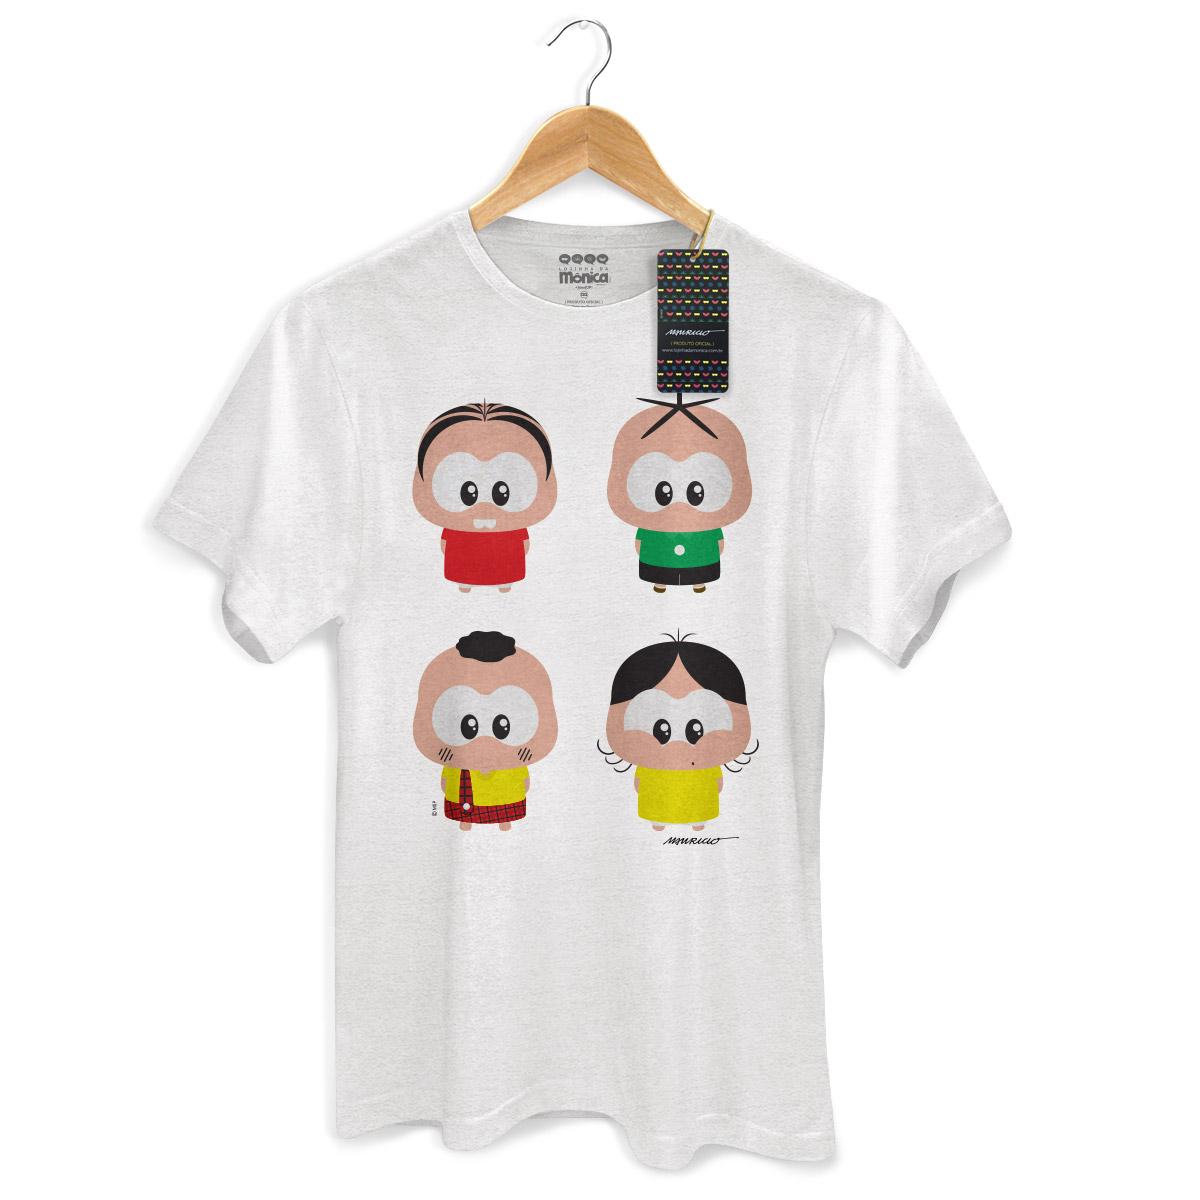 Camiseta Masculina Turma da Mônica Toy A Turma Toy